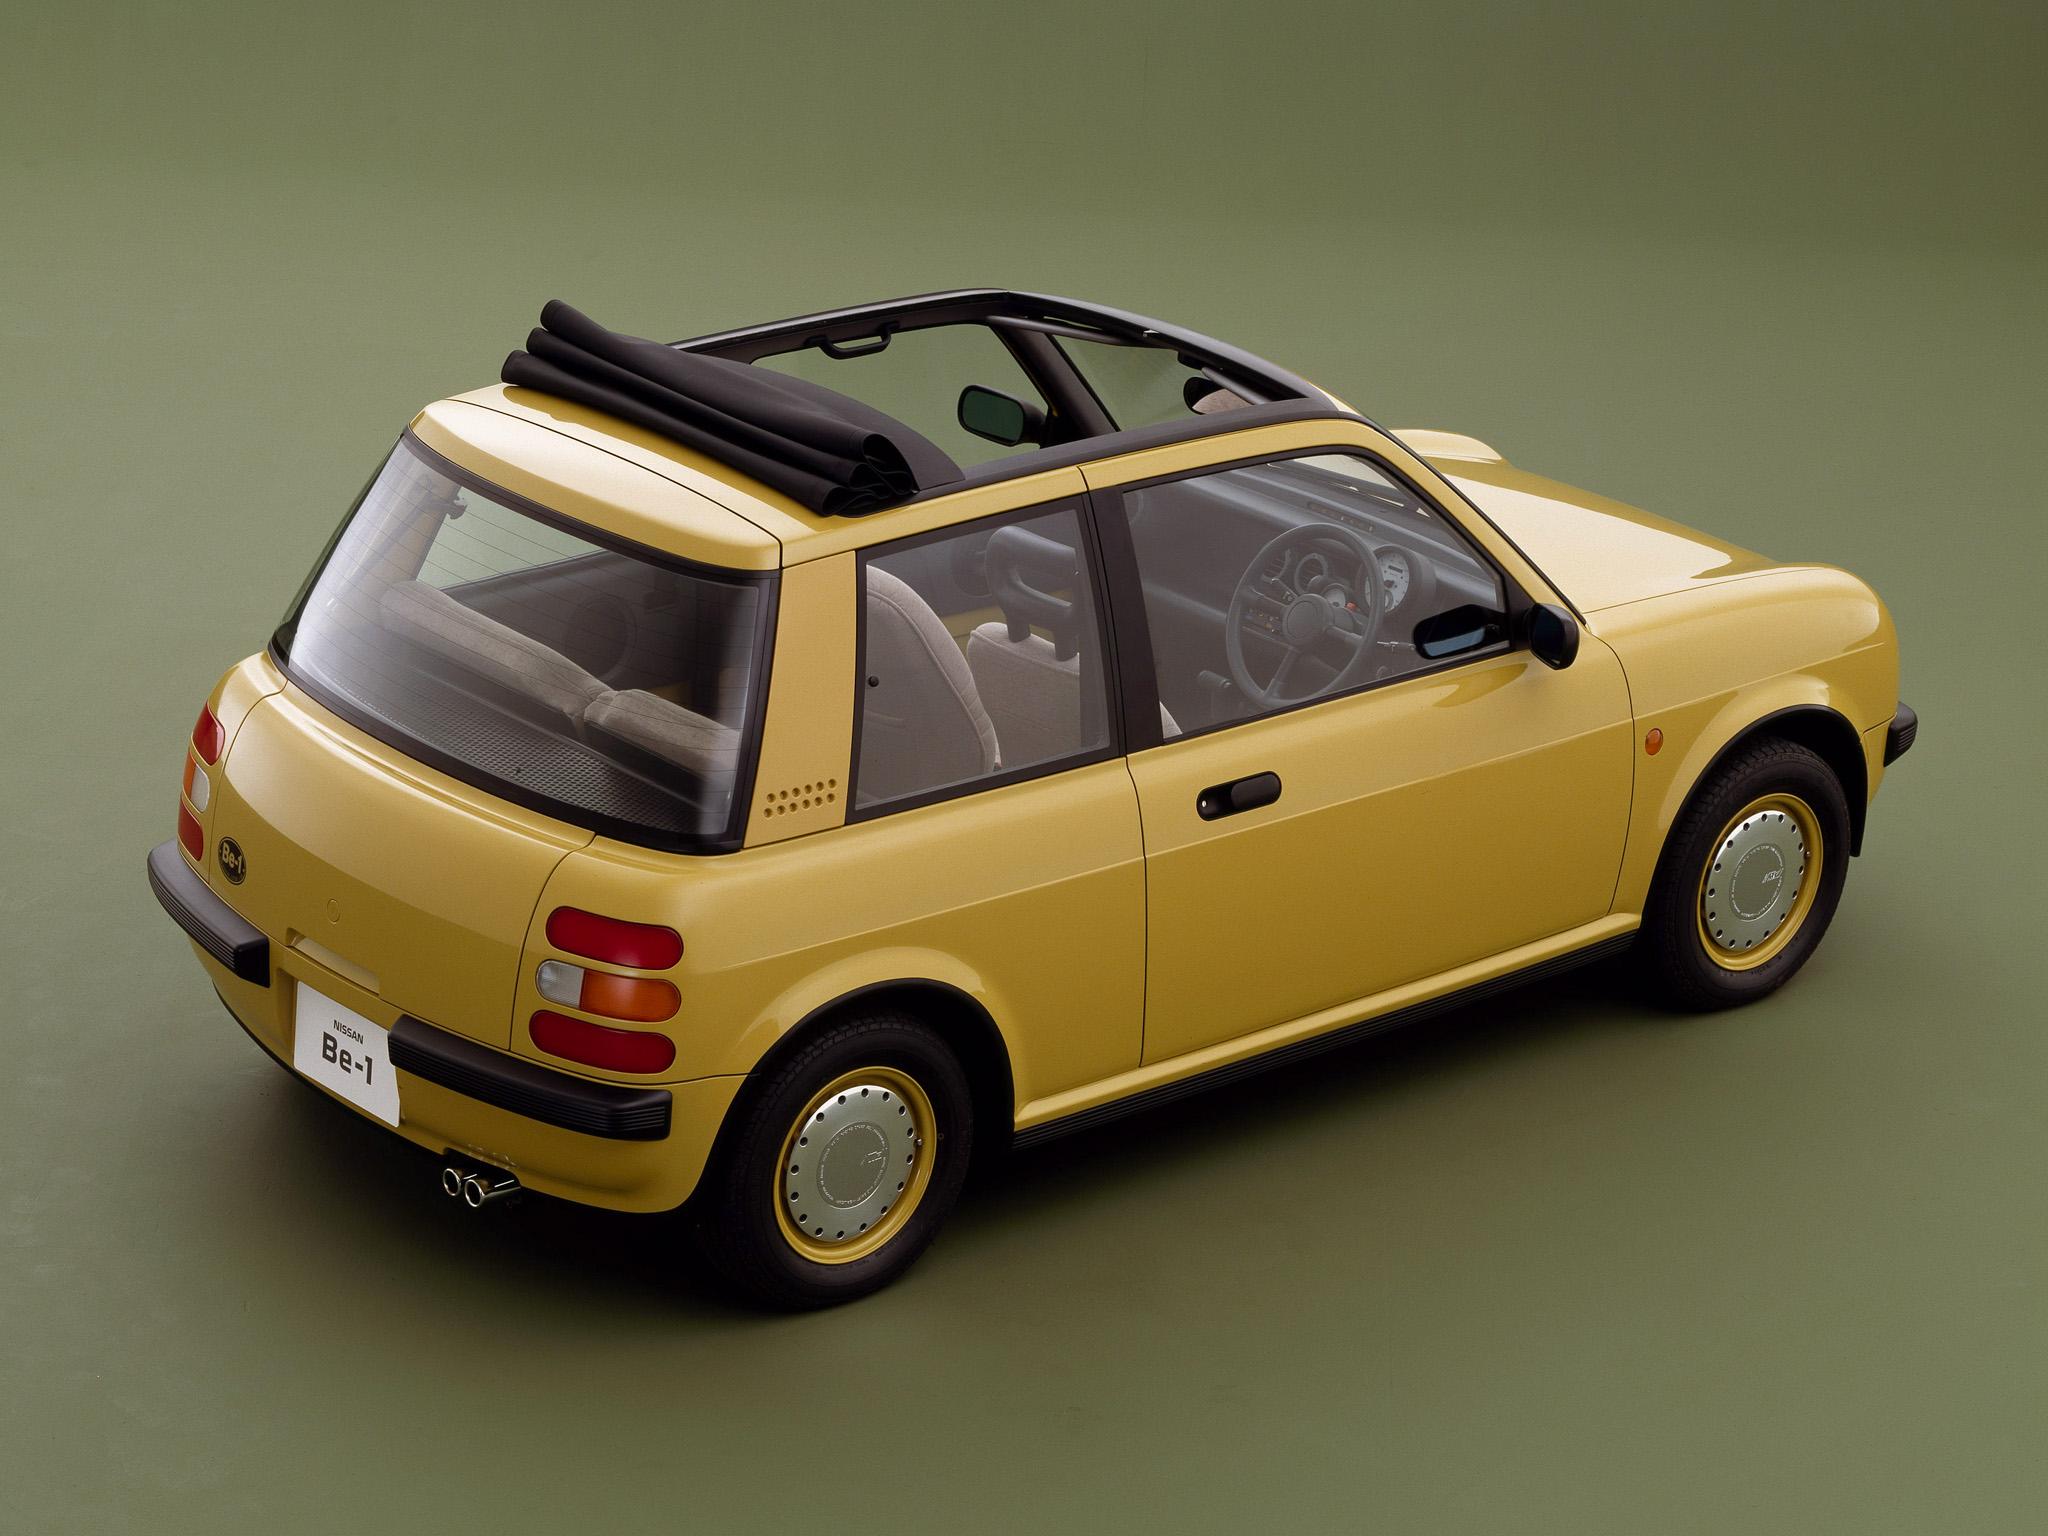 Nissan Be-1 overhead